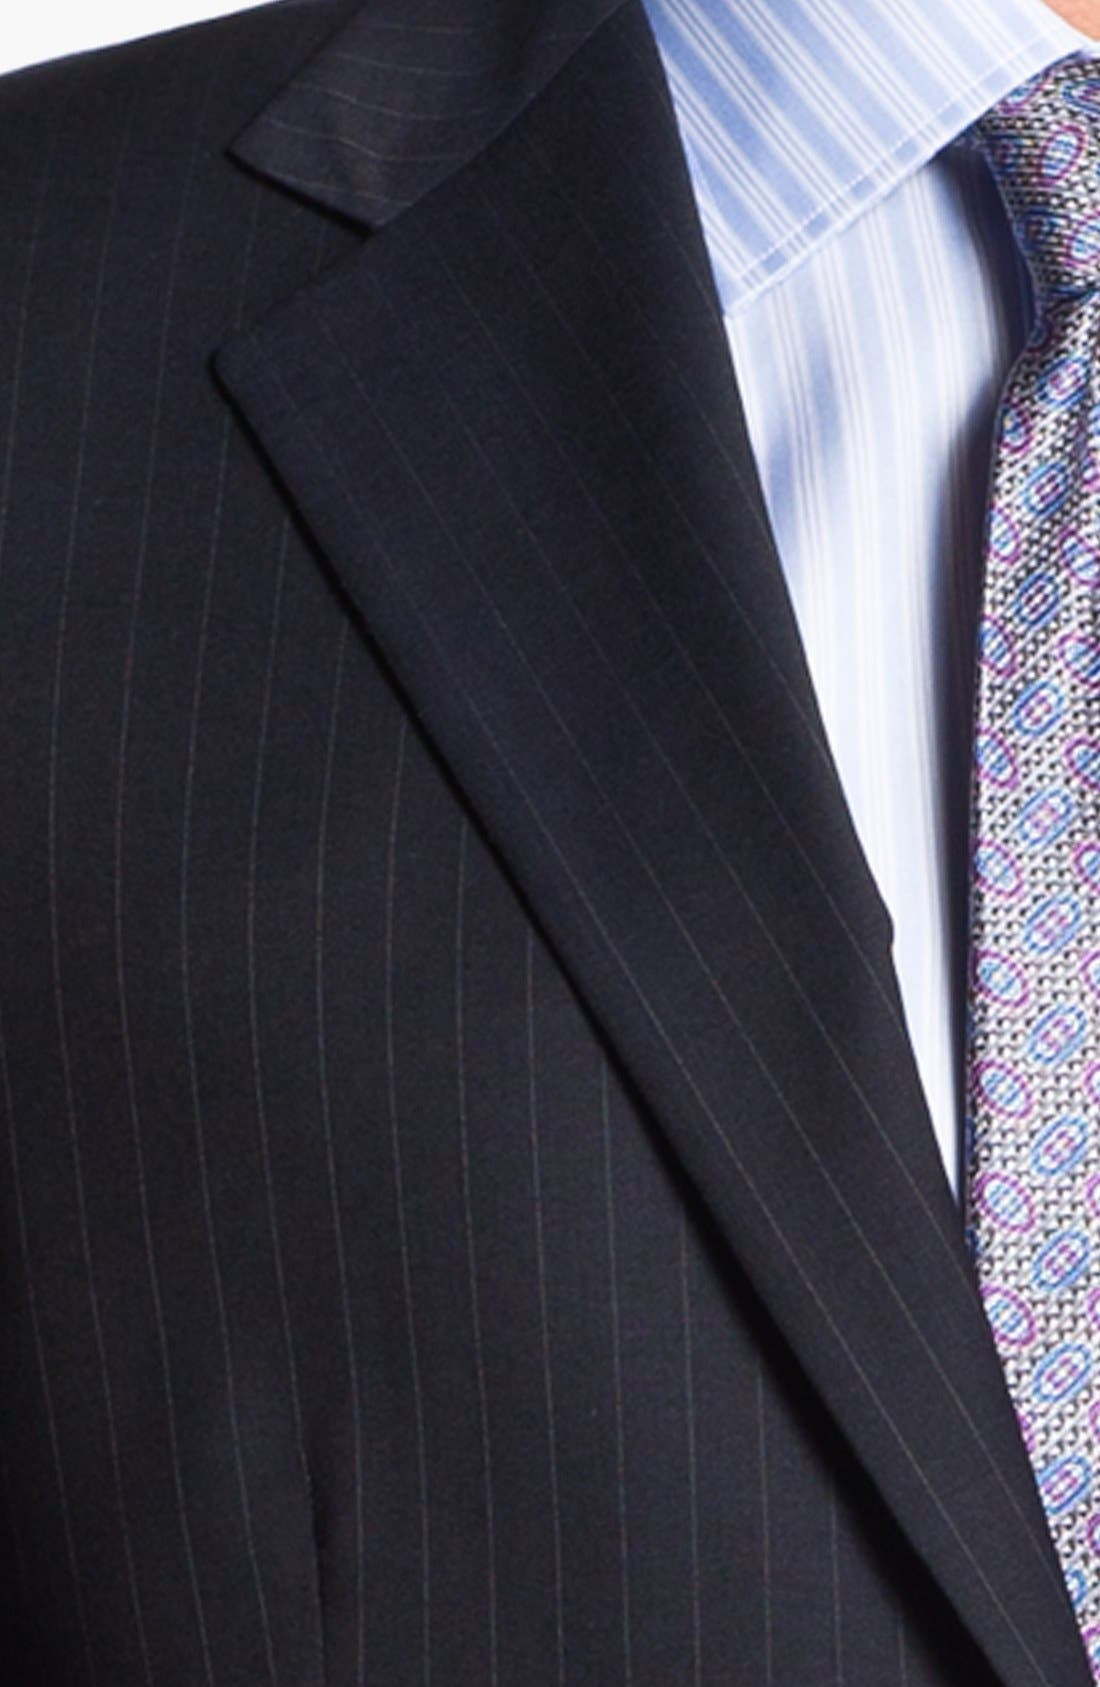 Alternate Image 2  - Joseph Abboud 'Signature Silver' Stripe Wool Suit